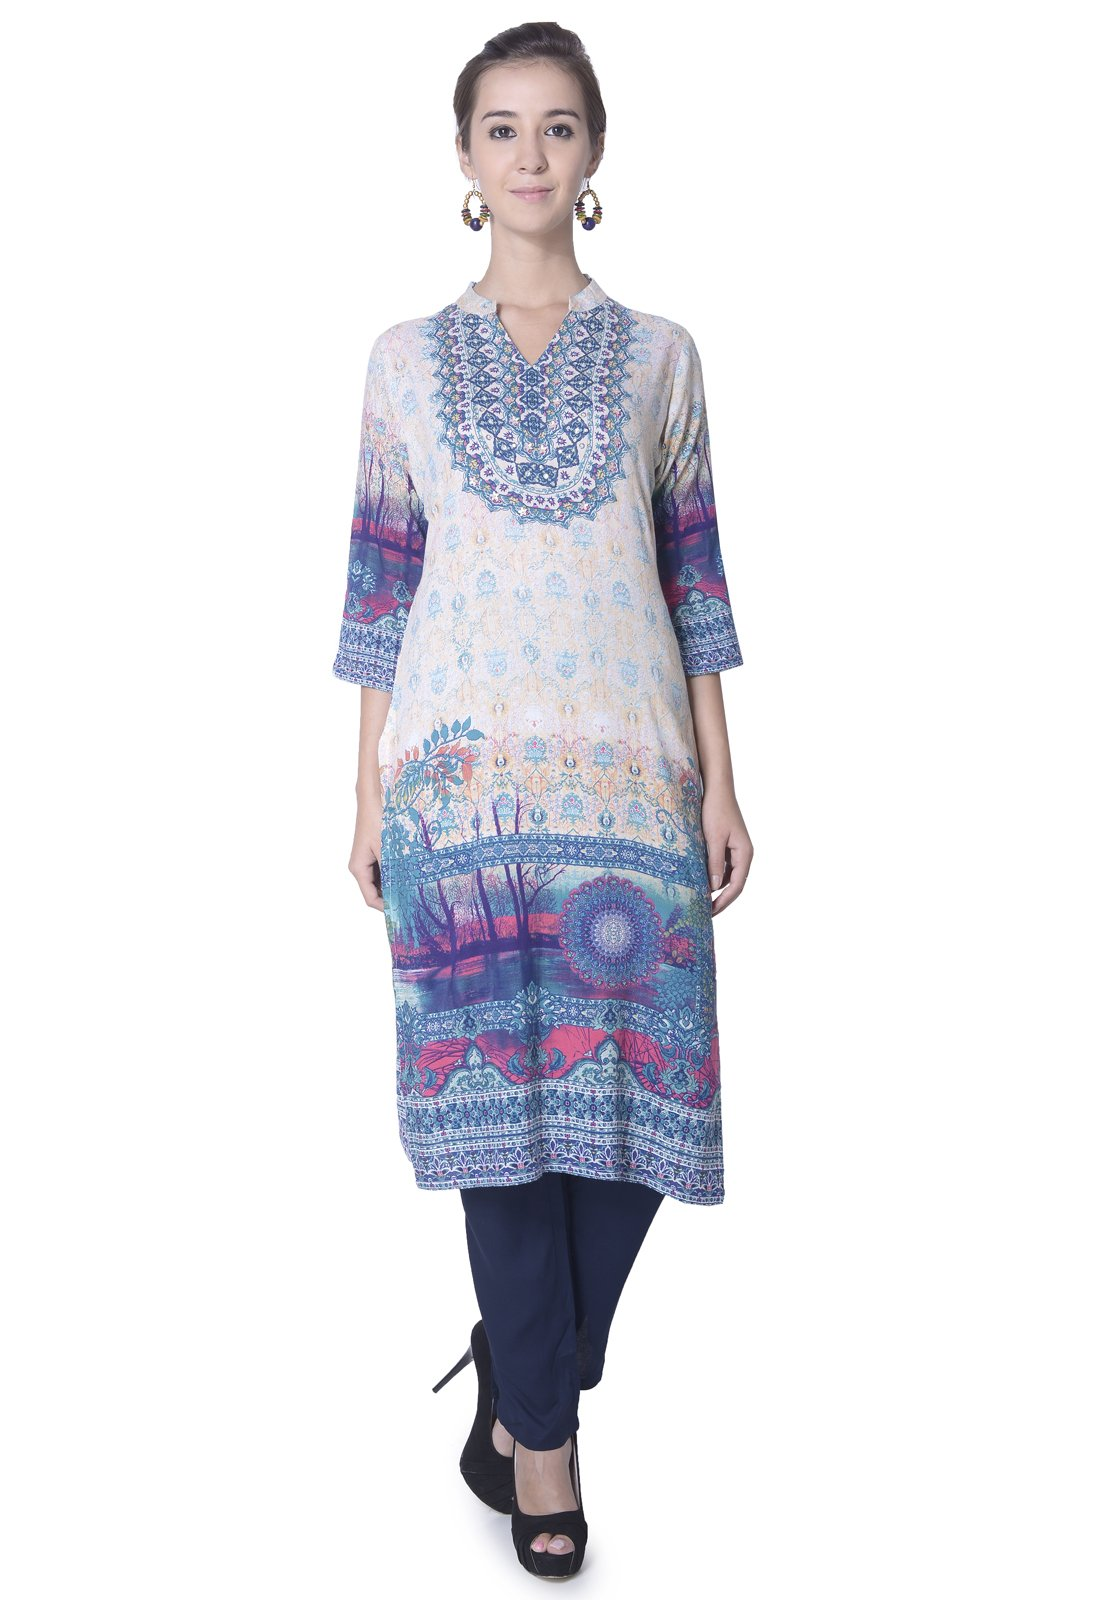 Lagi Designer Women Rayon Straight Floral Printed Kurti for Women Tunic Top r 3/4 Sleeve Dress. (XL, Blue 3) by Lagi